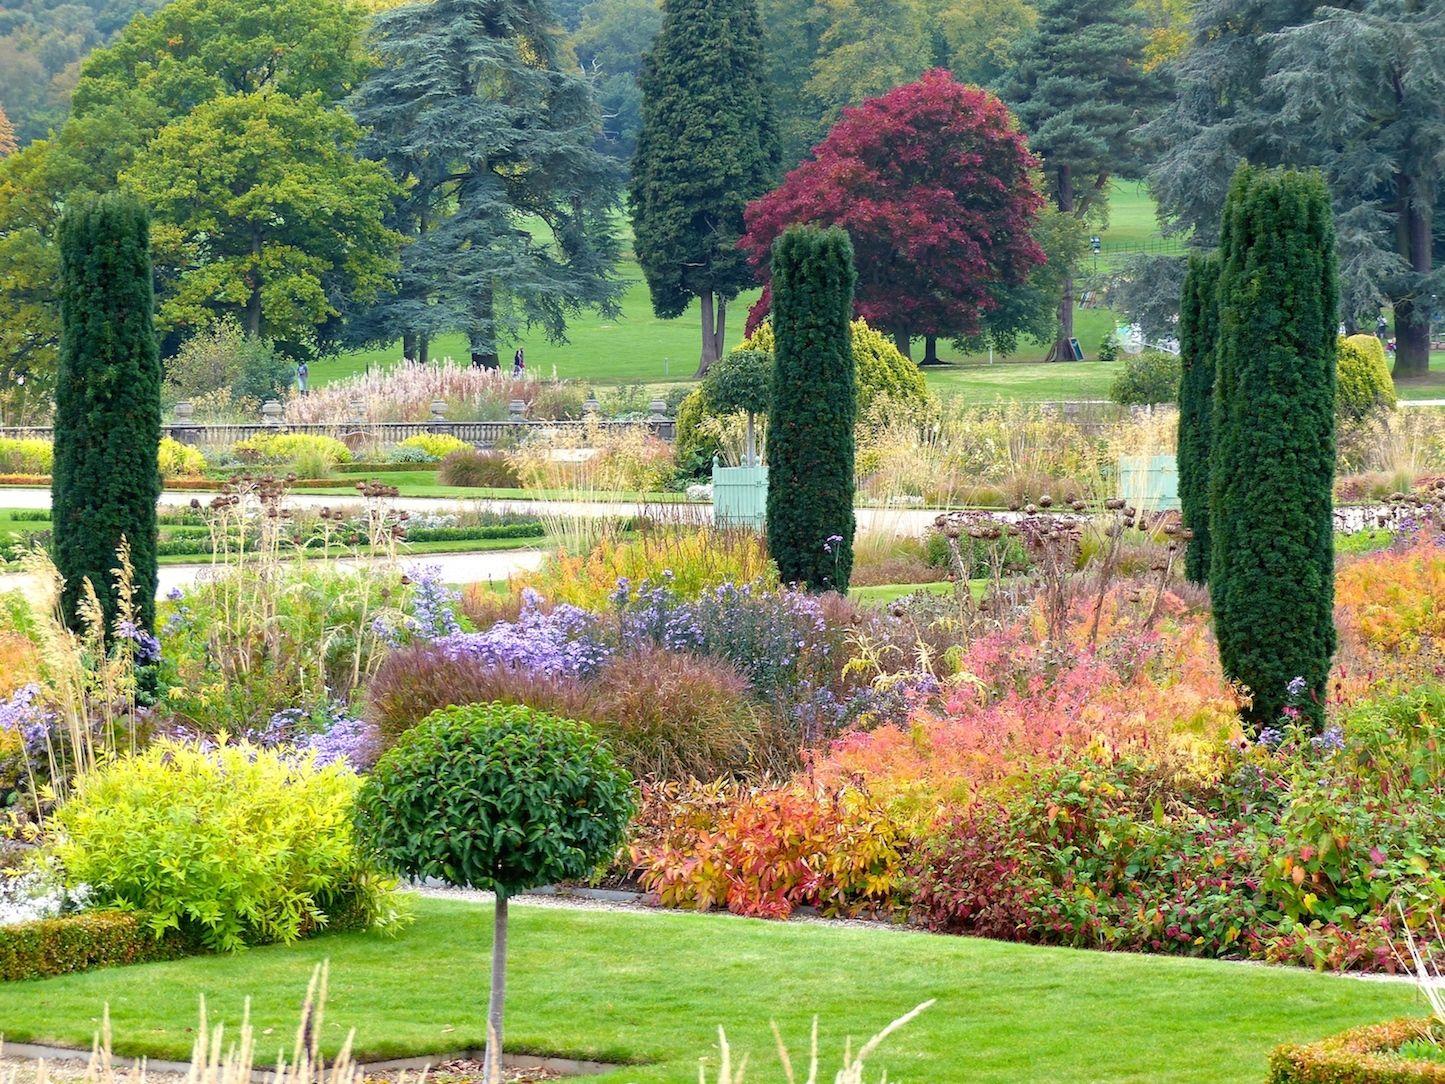 Autumn Colours In Trentham Gardens Stoke On Trent Garden Design Stoke On Trent Plant Design